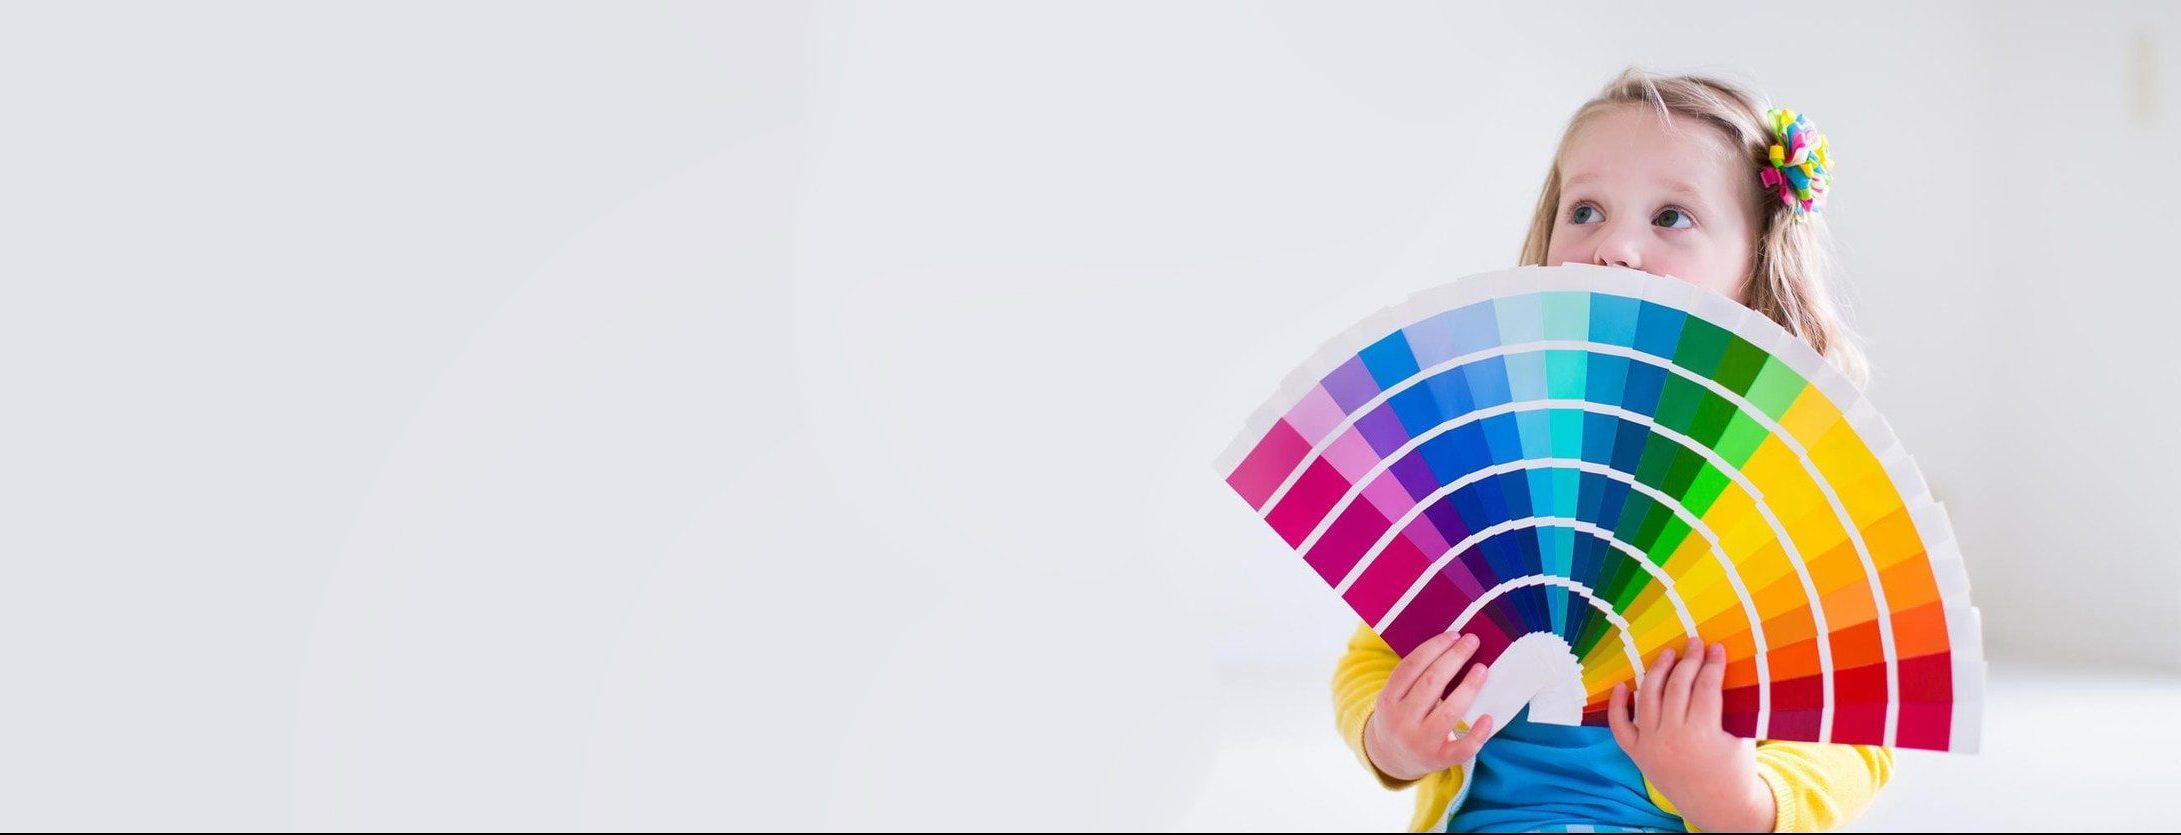 Nena con paleta de colores